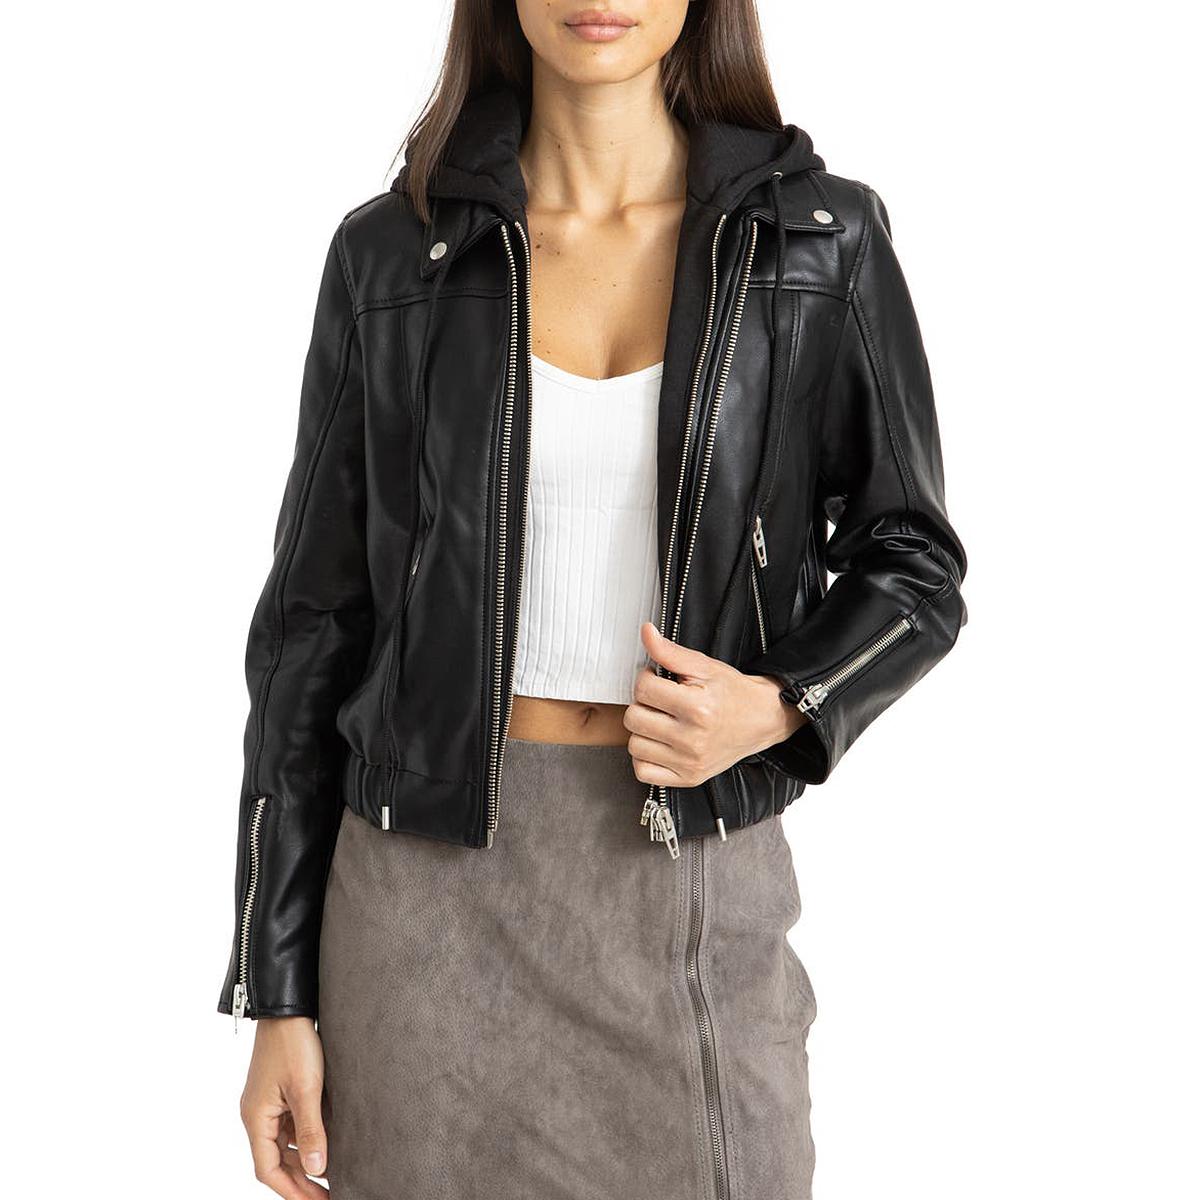 nordstrom-anniversary-sale-zara-style-blanknyc-faux-leather-jacket